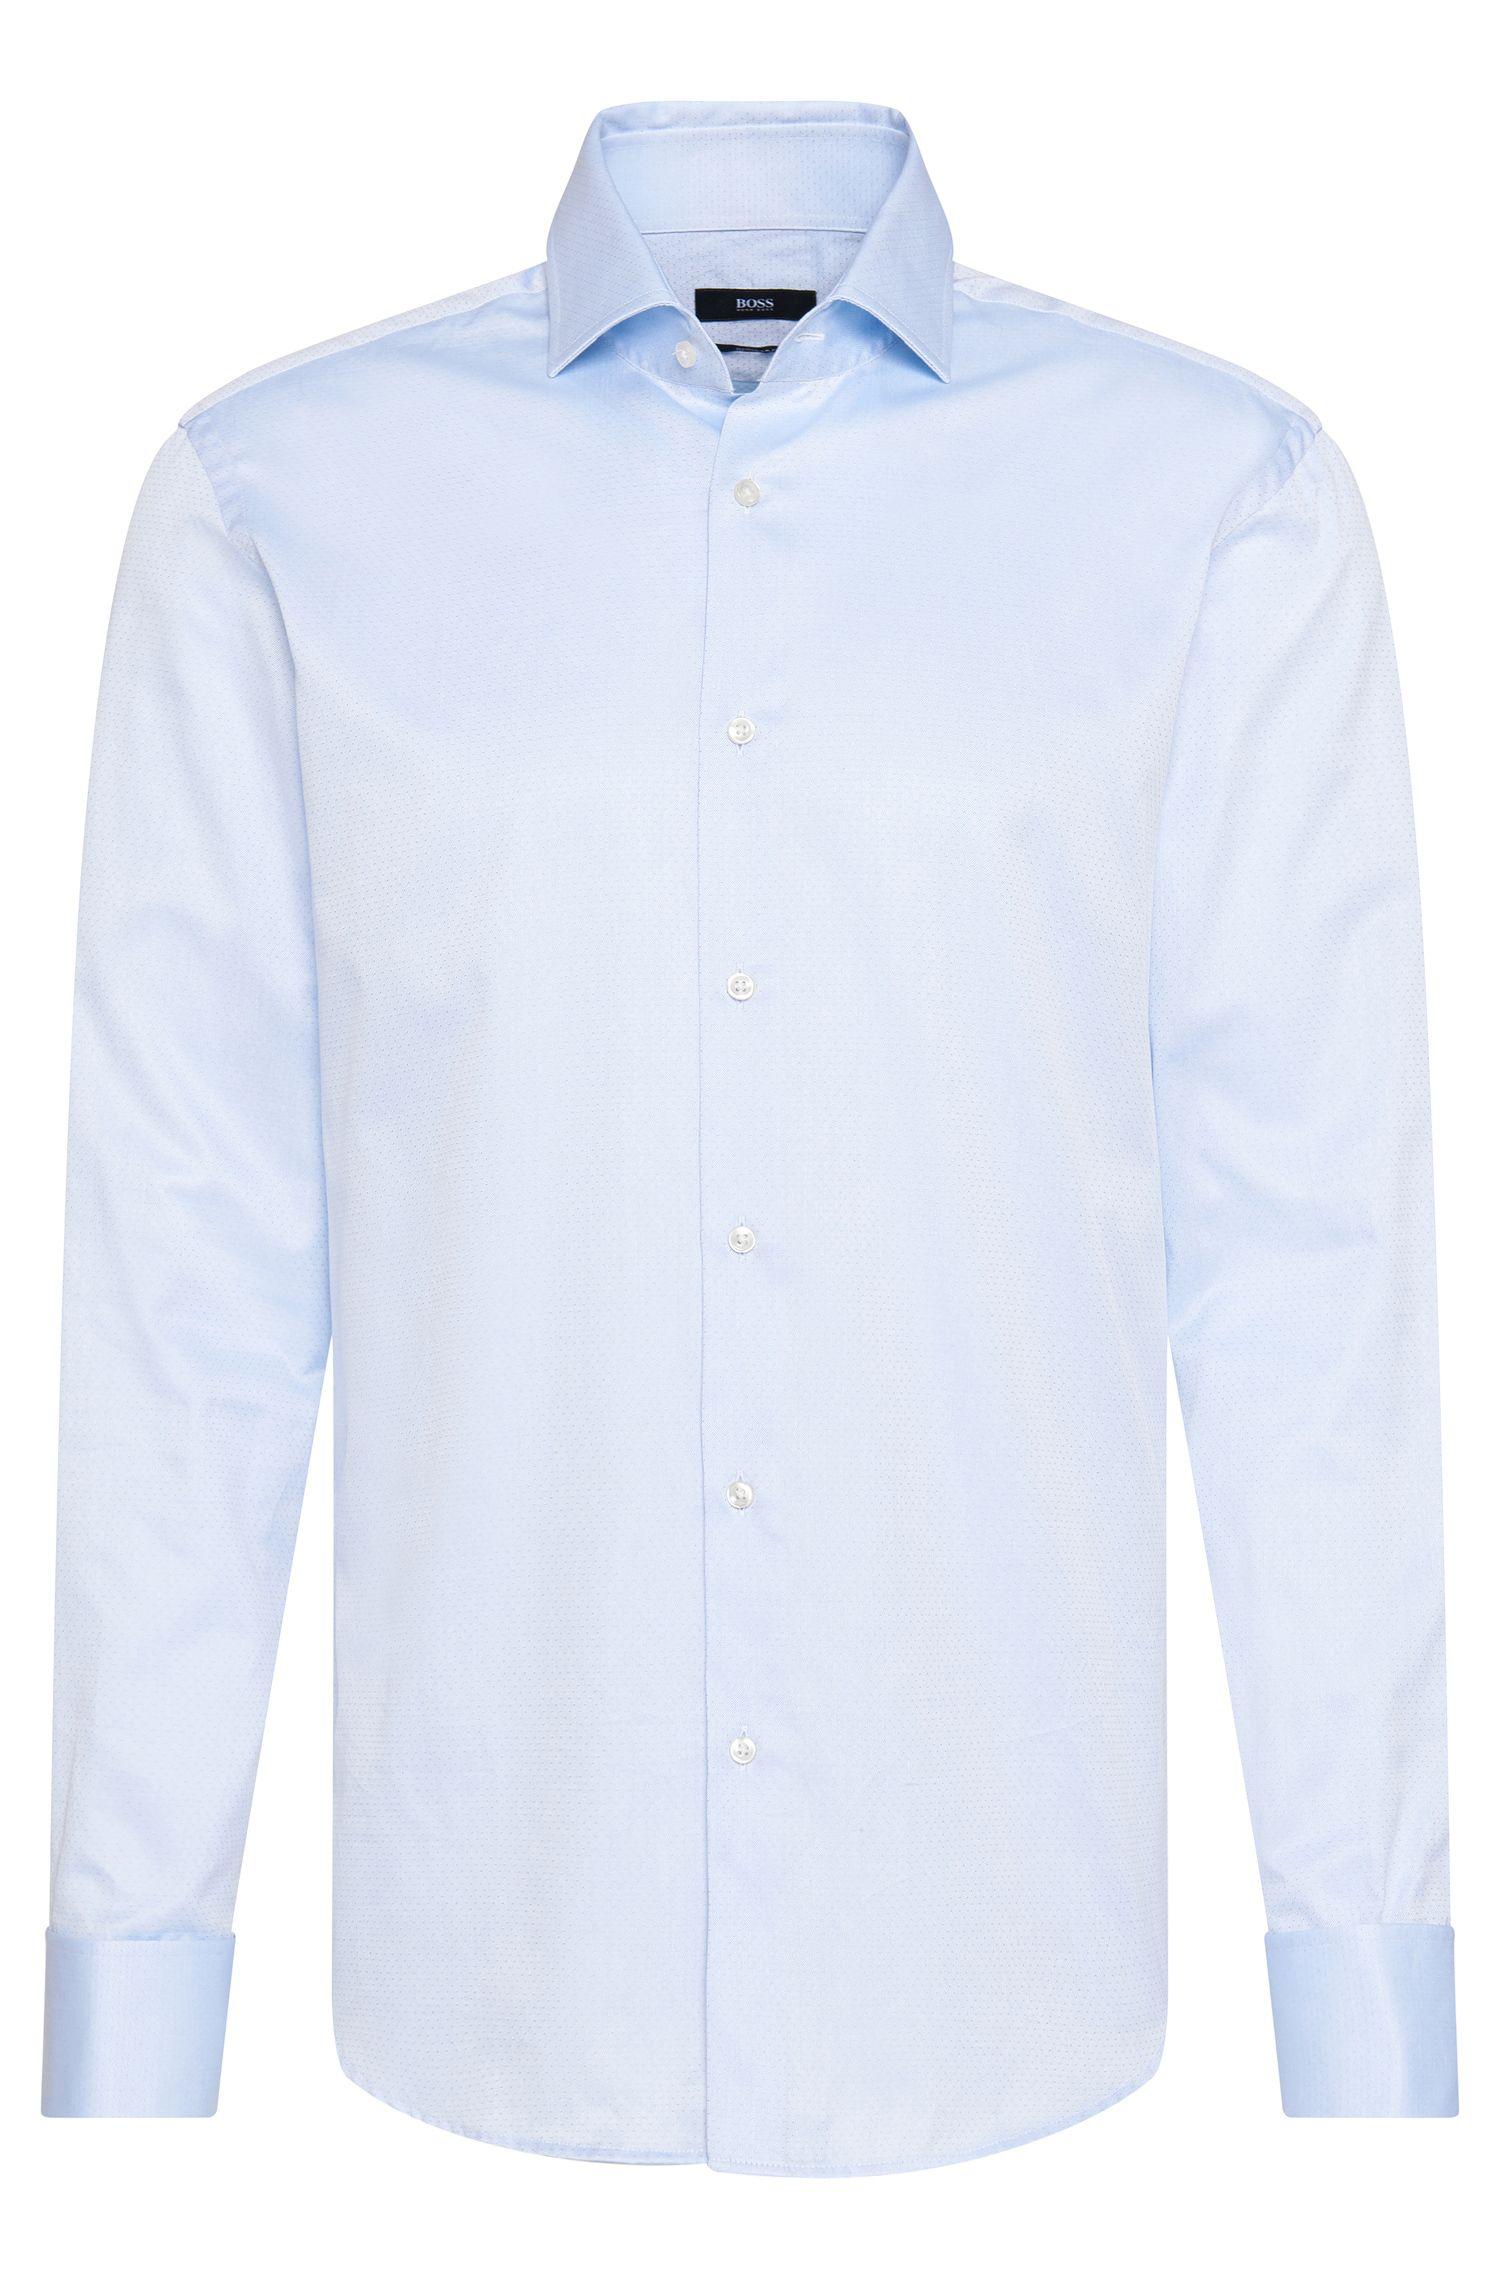 'Gardner' | Regular Fit, Italian Cotton French Cuff Dress Shirt